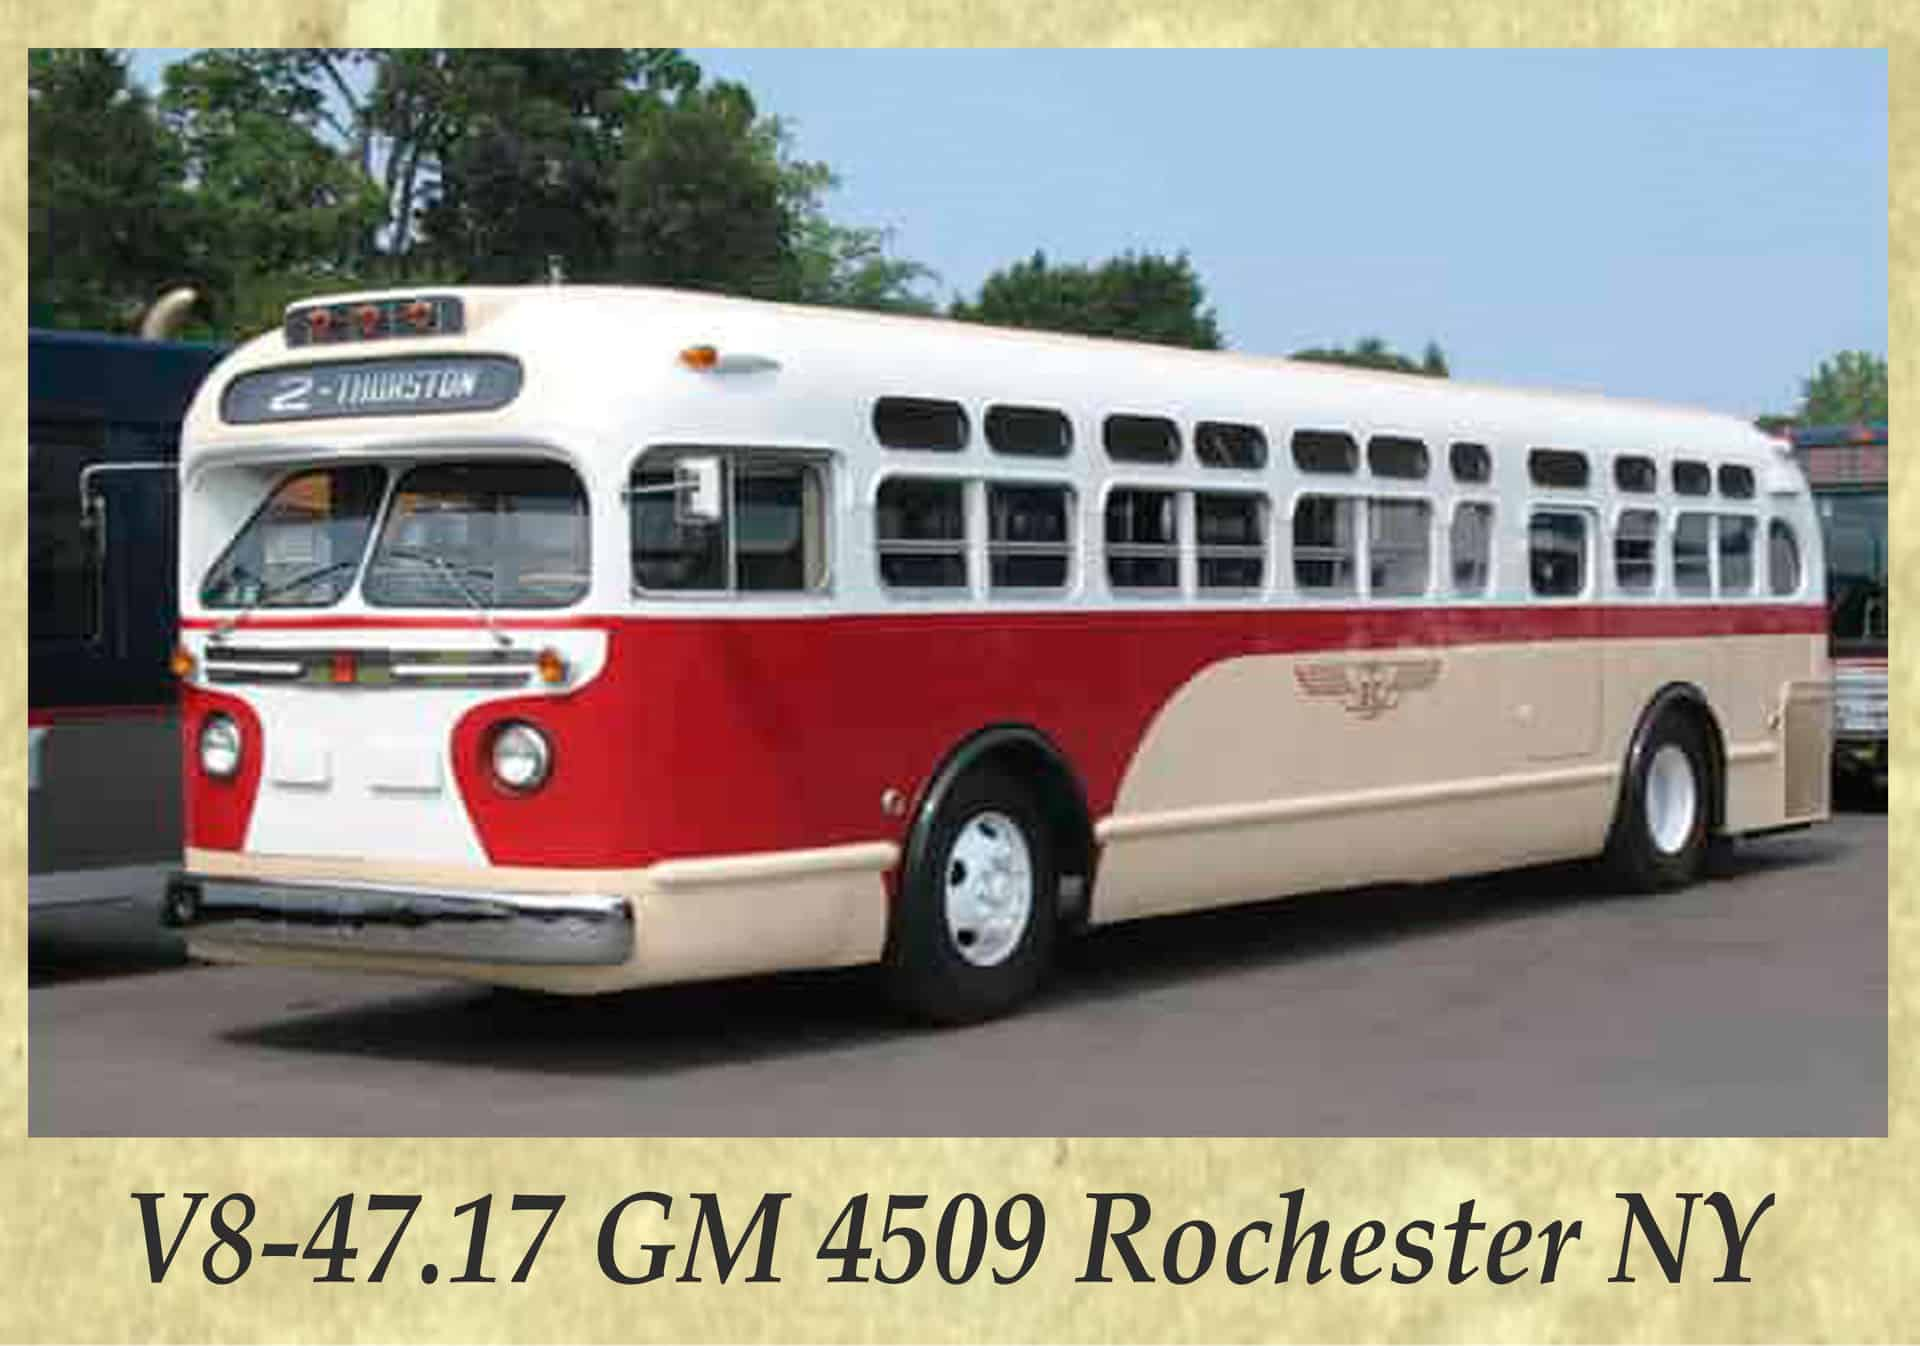 V8-47.17 GM 4509 Rochester NY